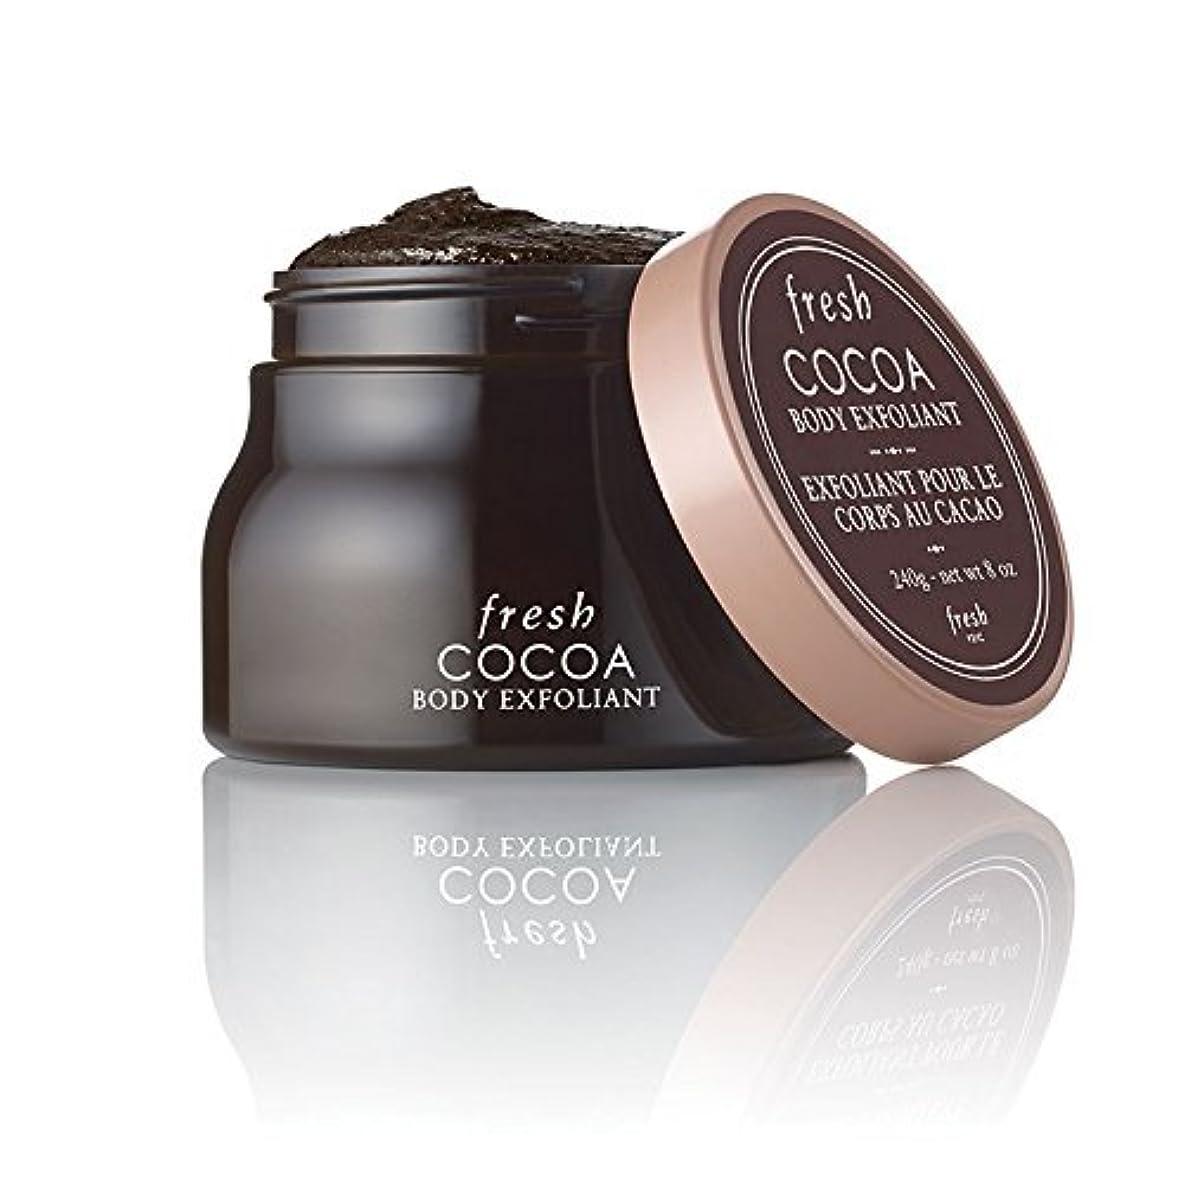 Fresh Cocoa Body Exfoliant (フレッシュ ココア ボディー エクスフォリアント) 150g by Fresh for Women